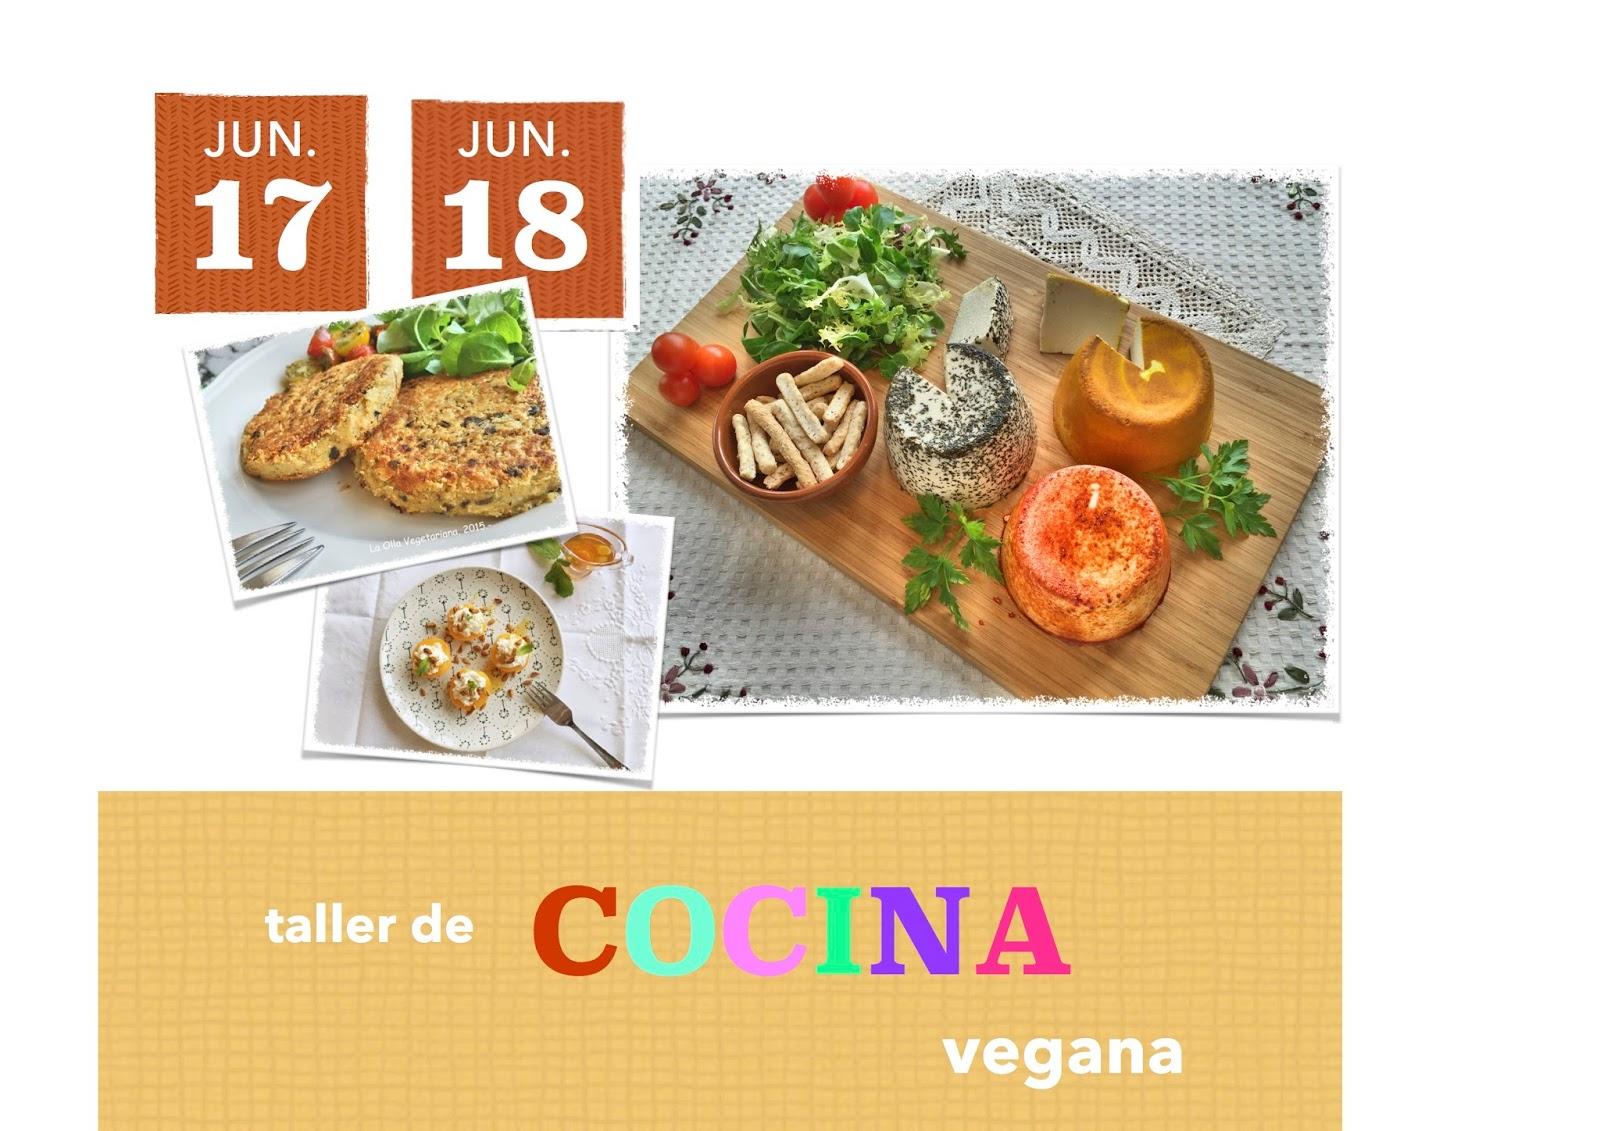 La olla vegetariana taller de cocina vegana for La cocina taller